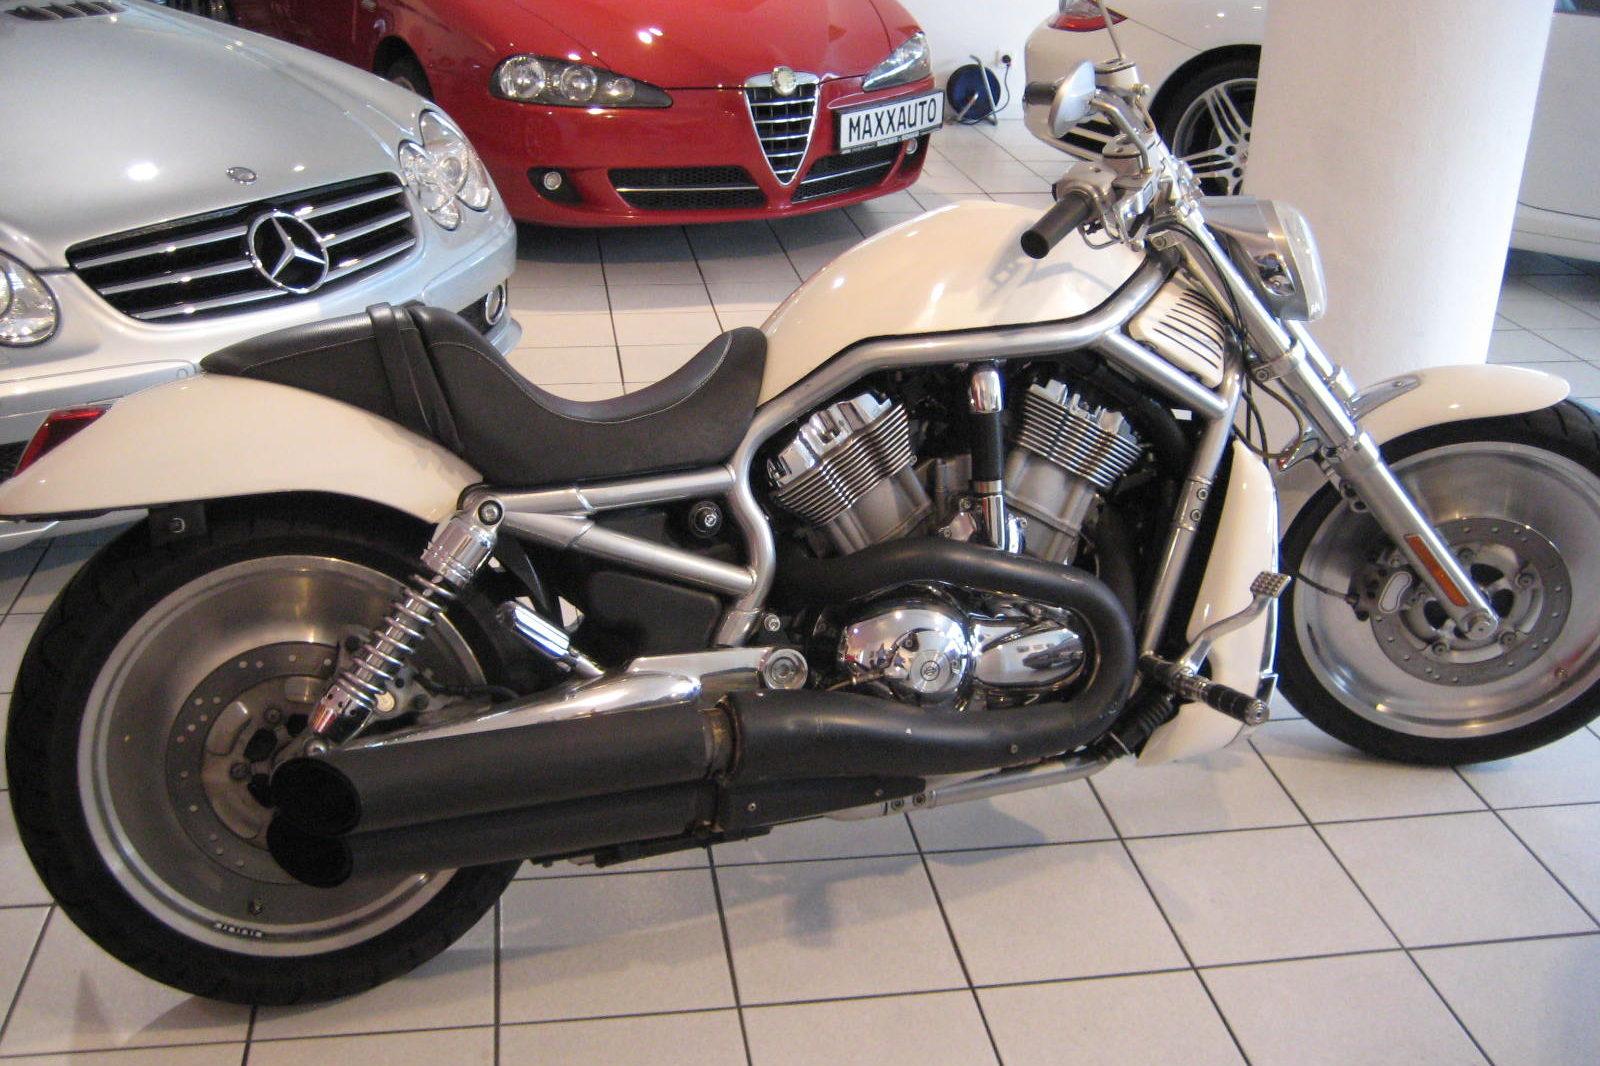 Harley Davidson V rod weiss